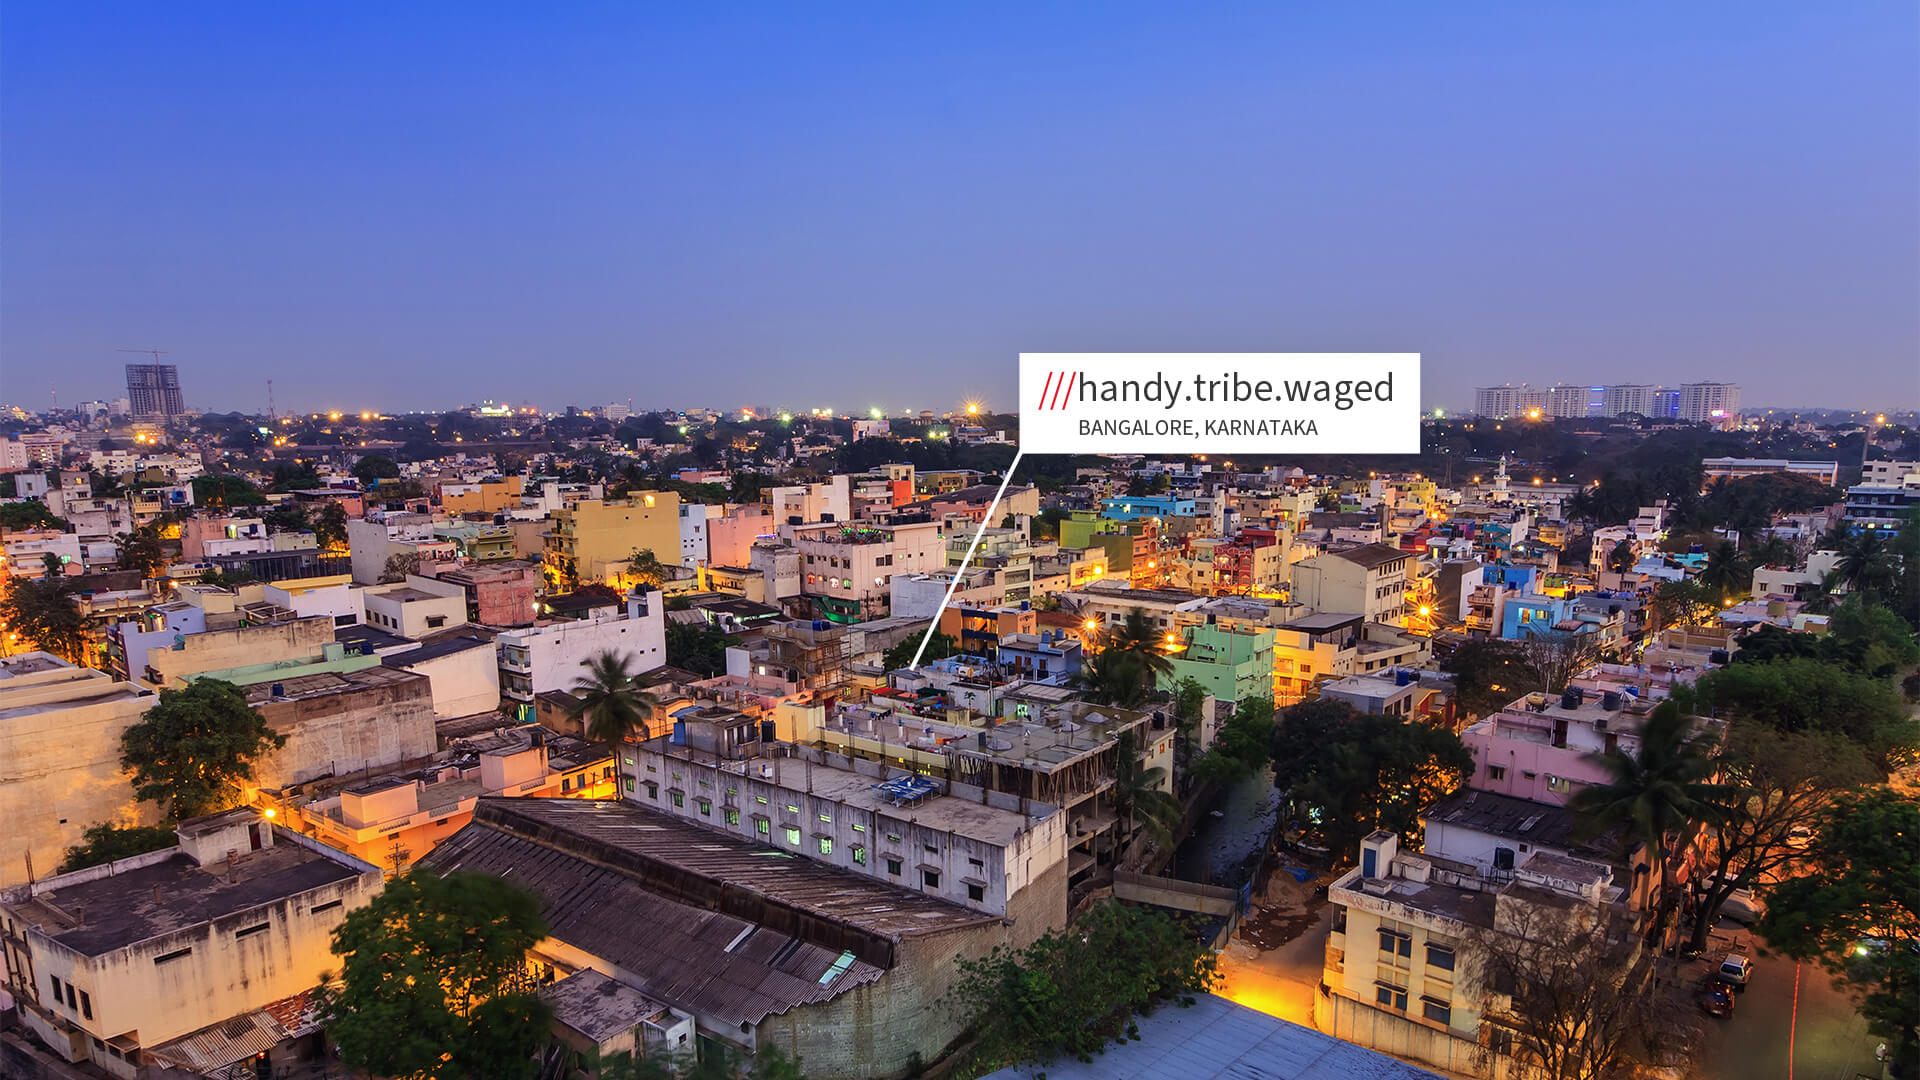 Bangalore travel accommodation with what3words address